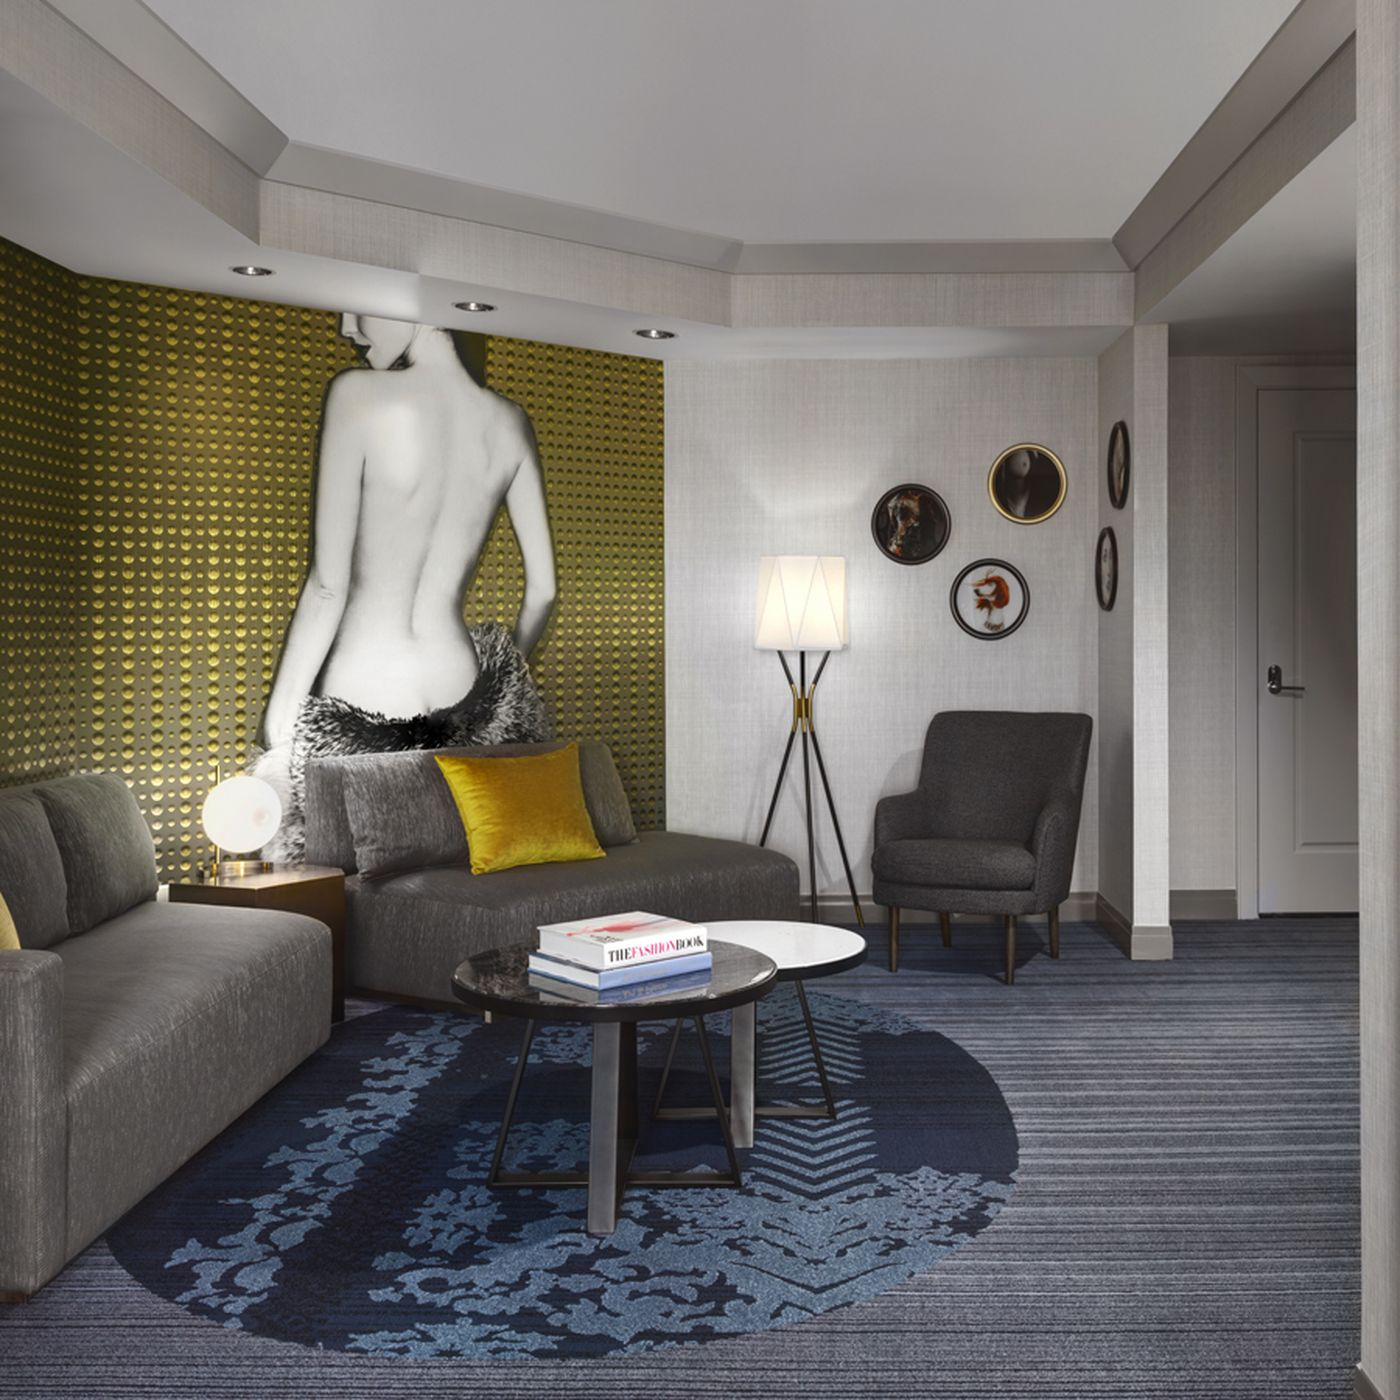 Magnificent Check Out The Cosmopolitan Of Las Vegass Major Upgrade Curbed Interior Design Ideas Tzicisoteloinfo